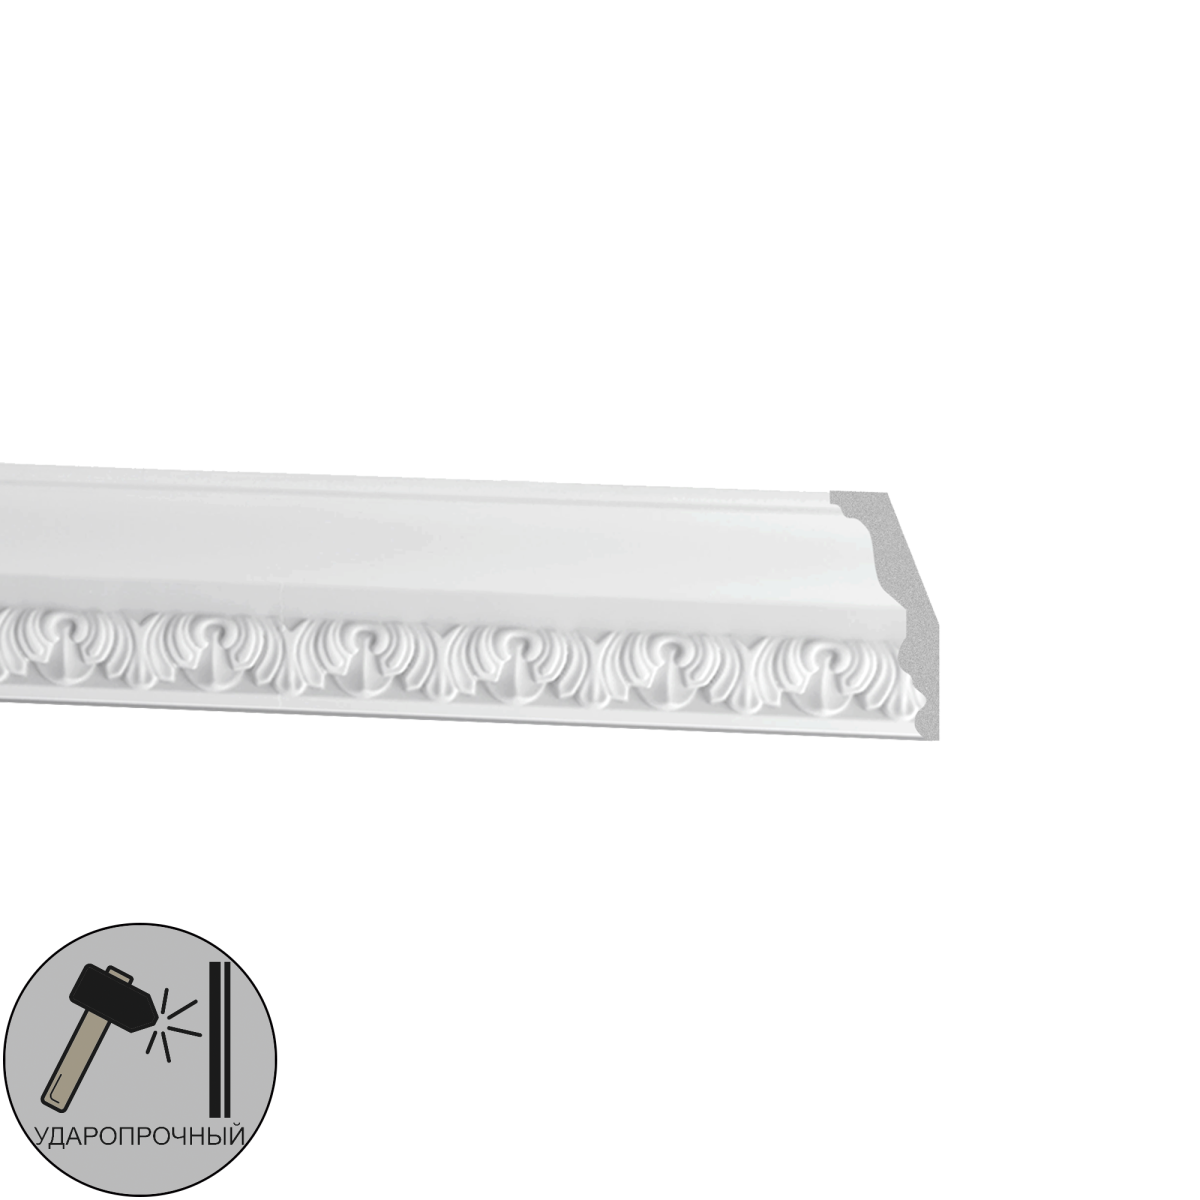 Плинтус потолочный полиуретан Decomaster DT 33 белый 3.5х8.7х200 см